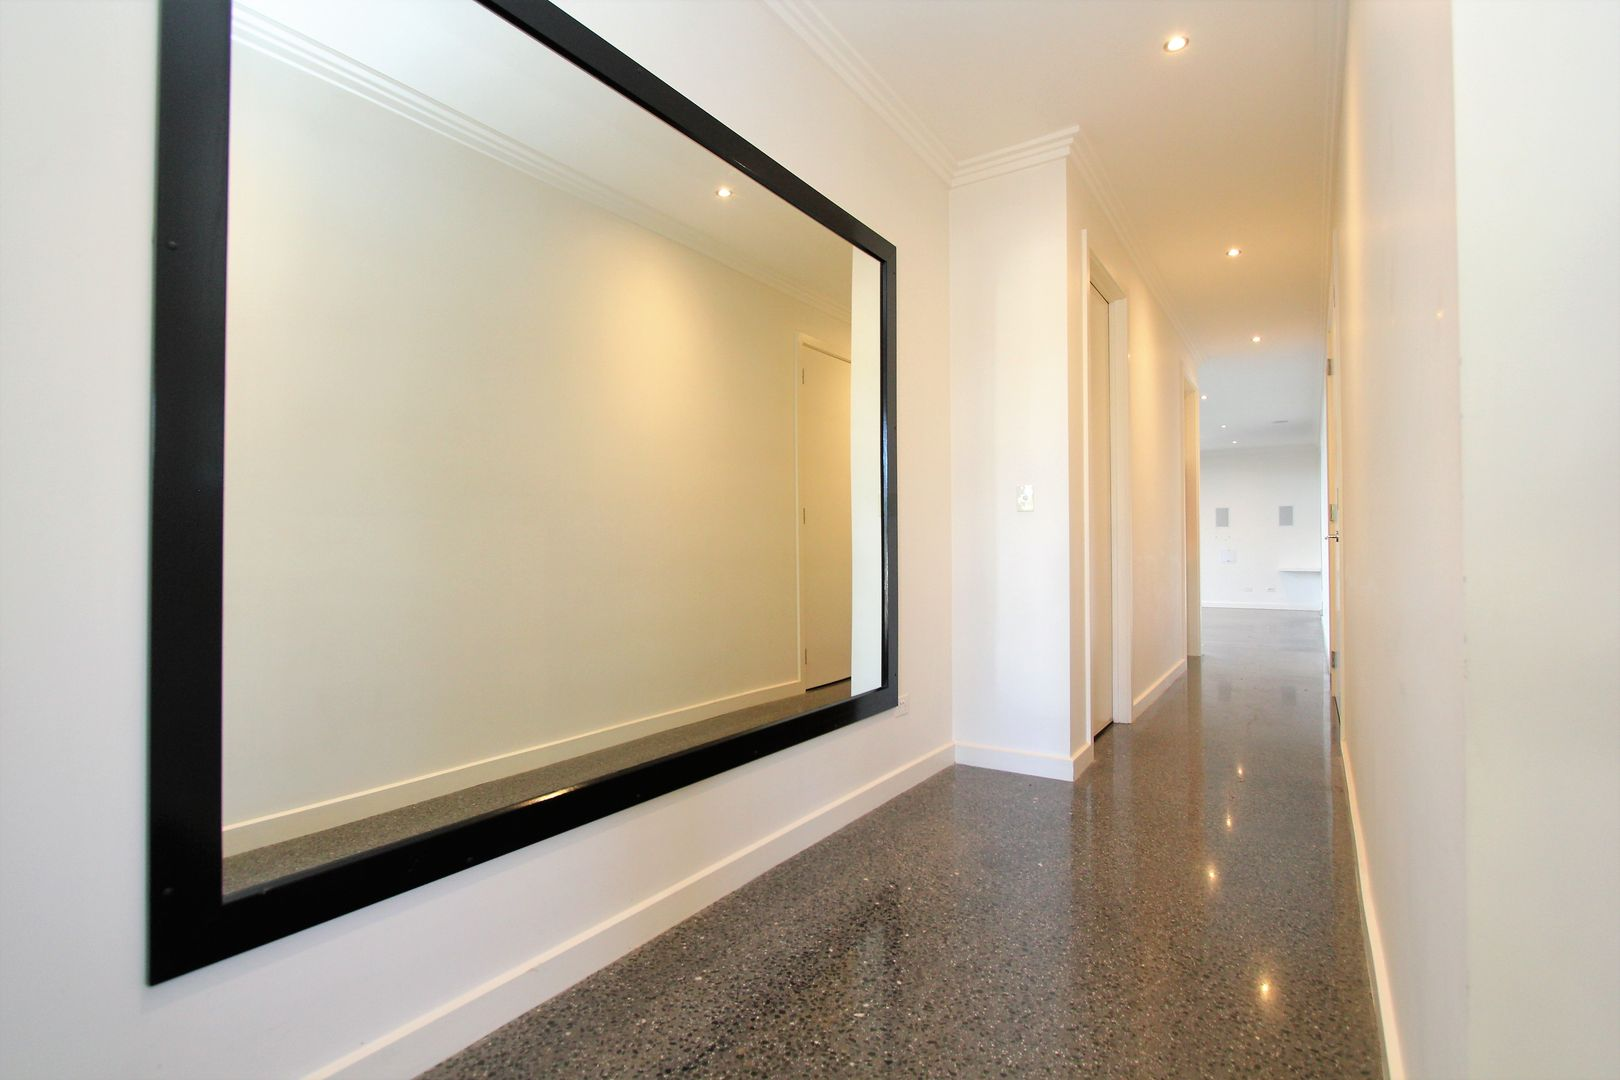 201 Ripon Street South, Ballarat Central VIC 3350, Image 1